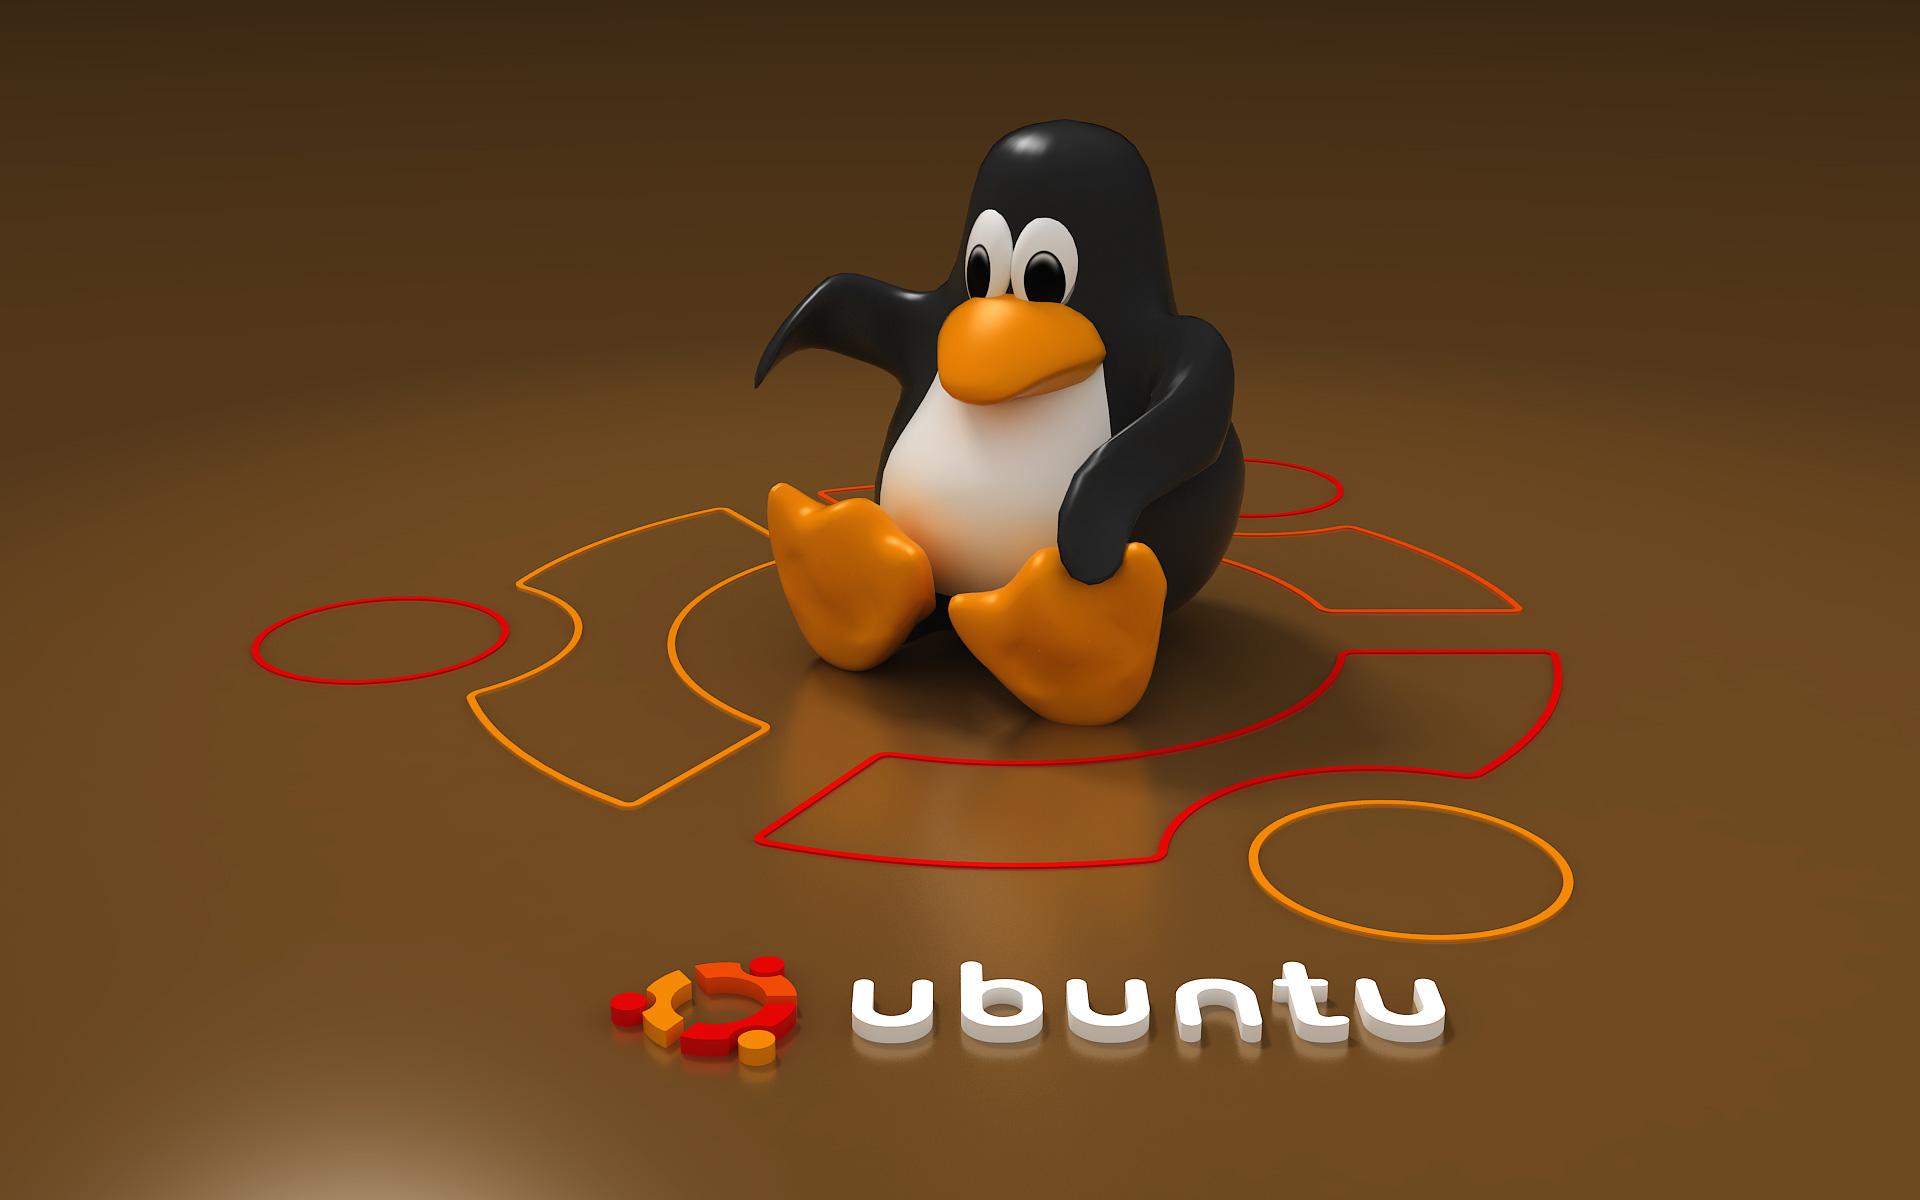 Ubuntu Linux Latest Live Install OS DVD for Laptop Desktop G3 14 04 1920x1200